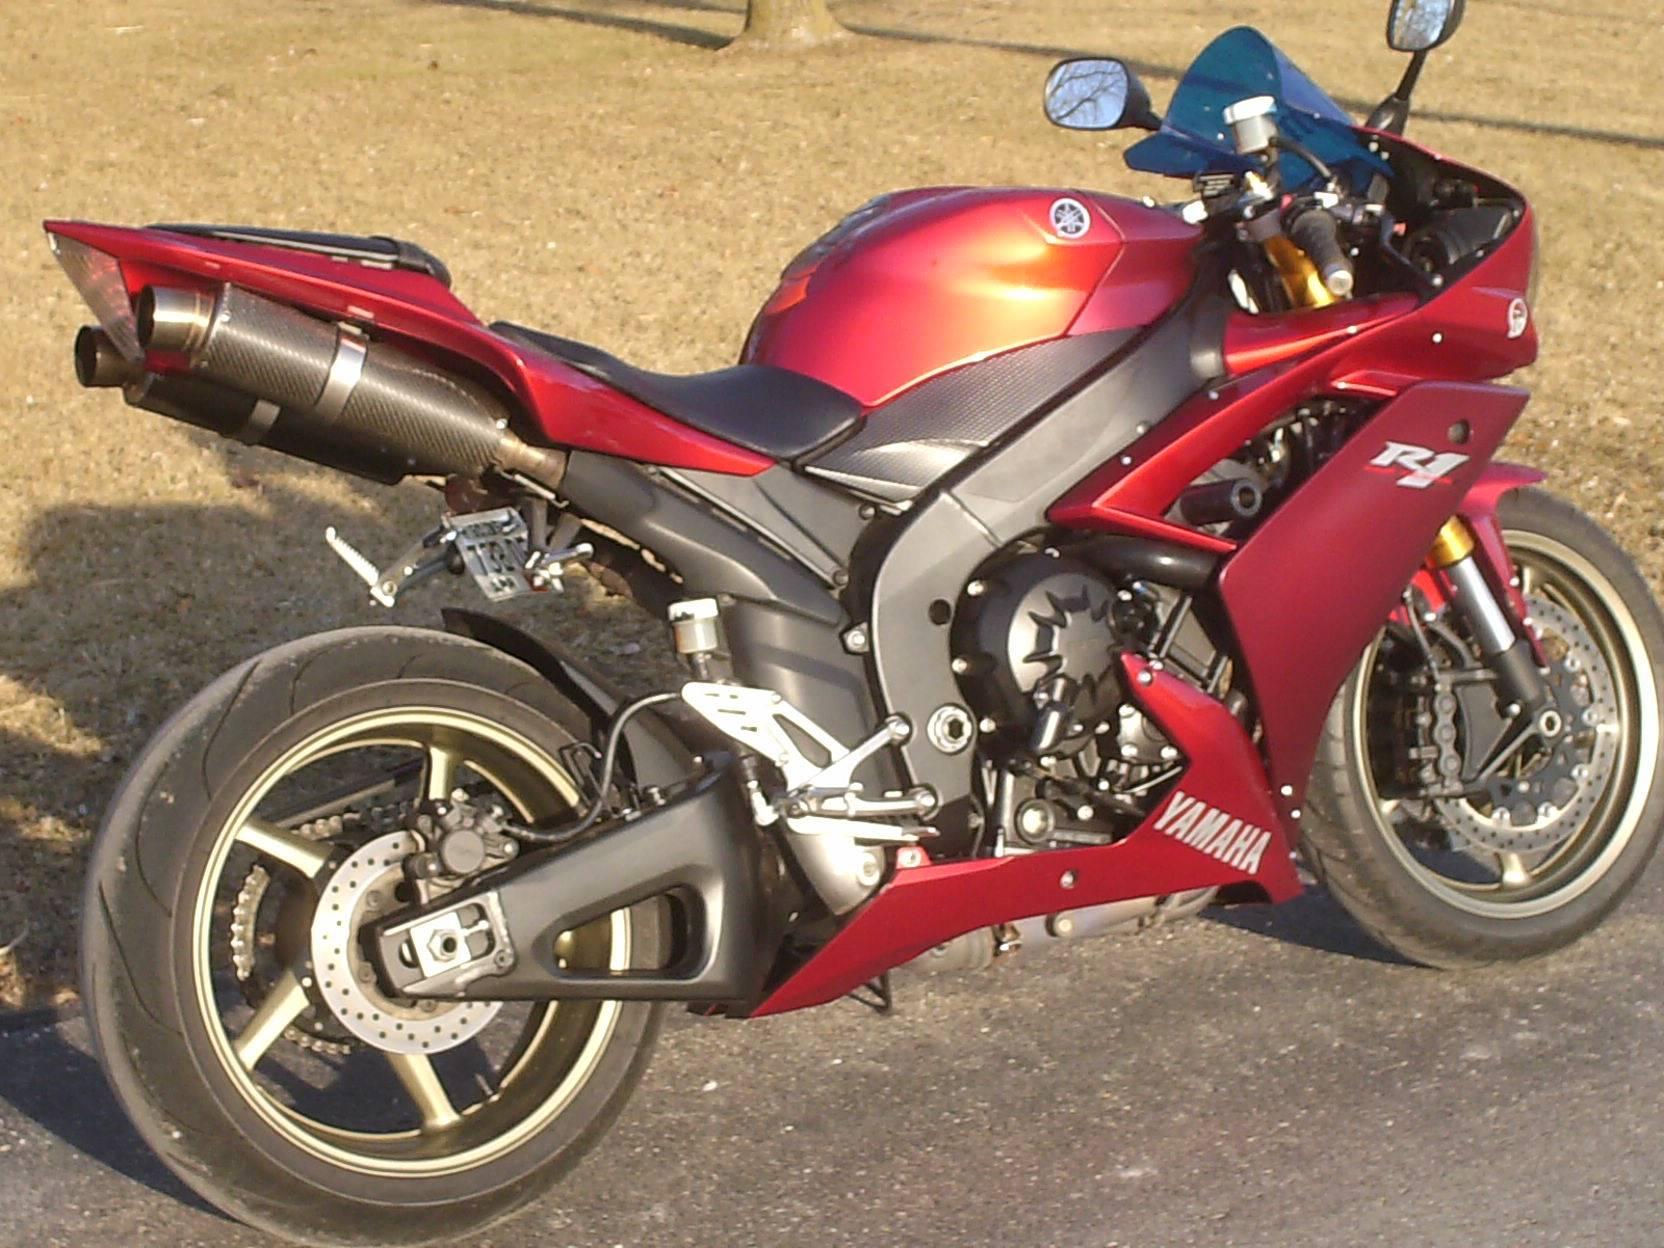 2008 Yamaha YZF-R1 2